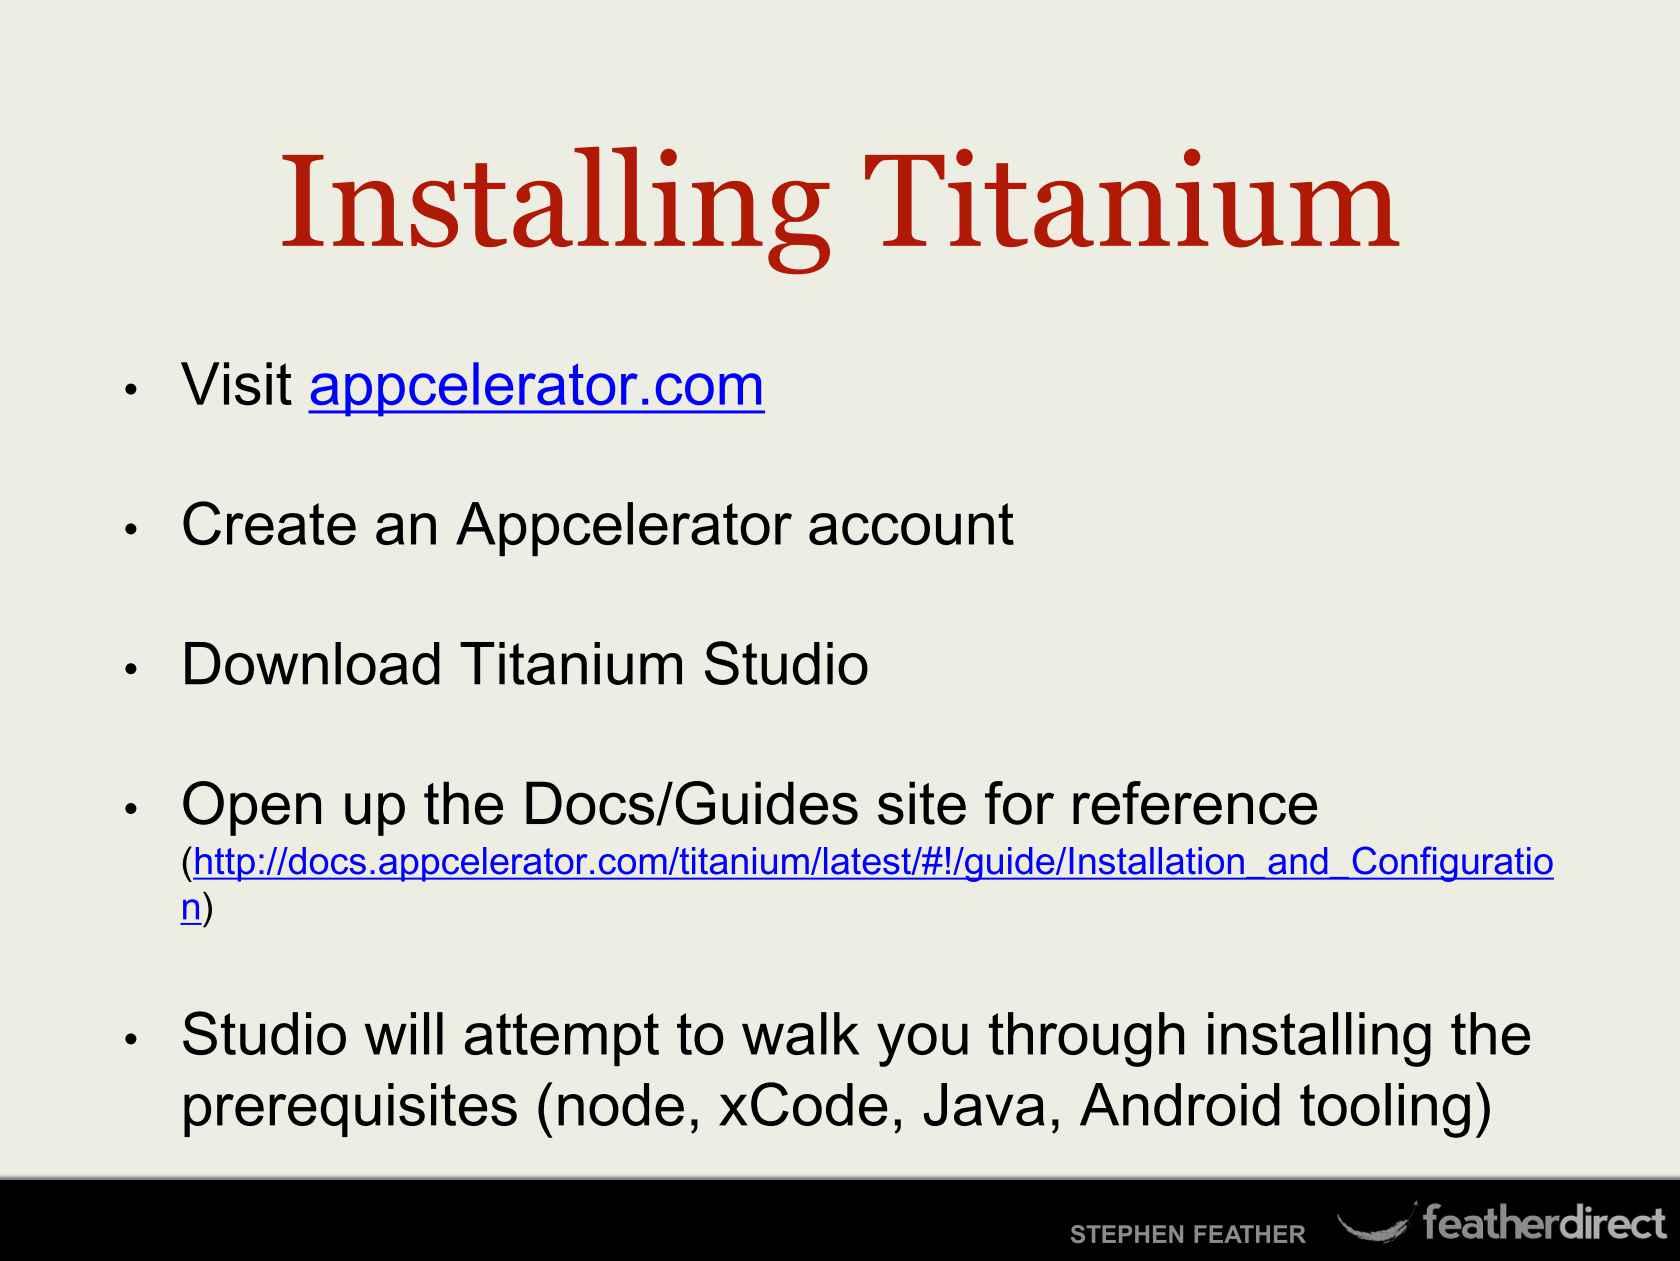 Cross-platform Native Development with Titanium